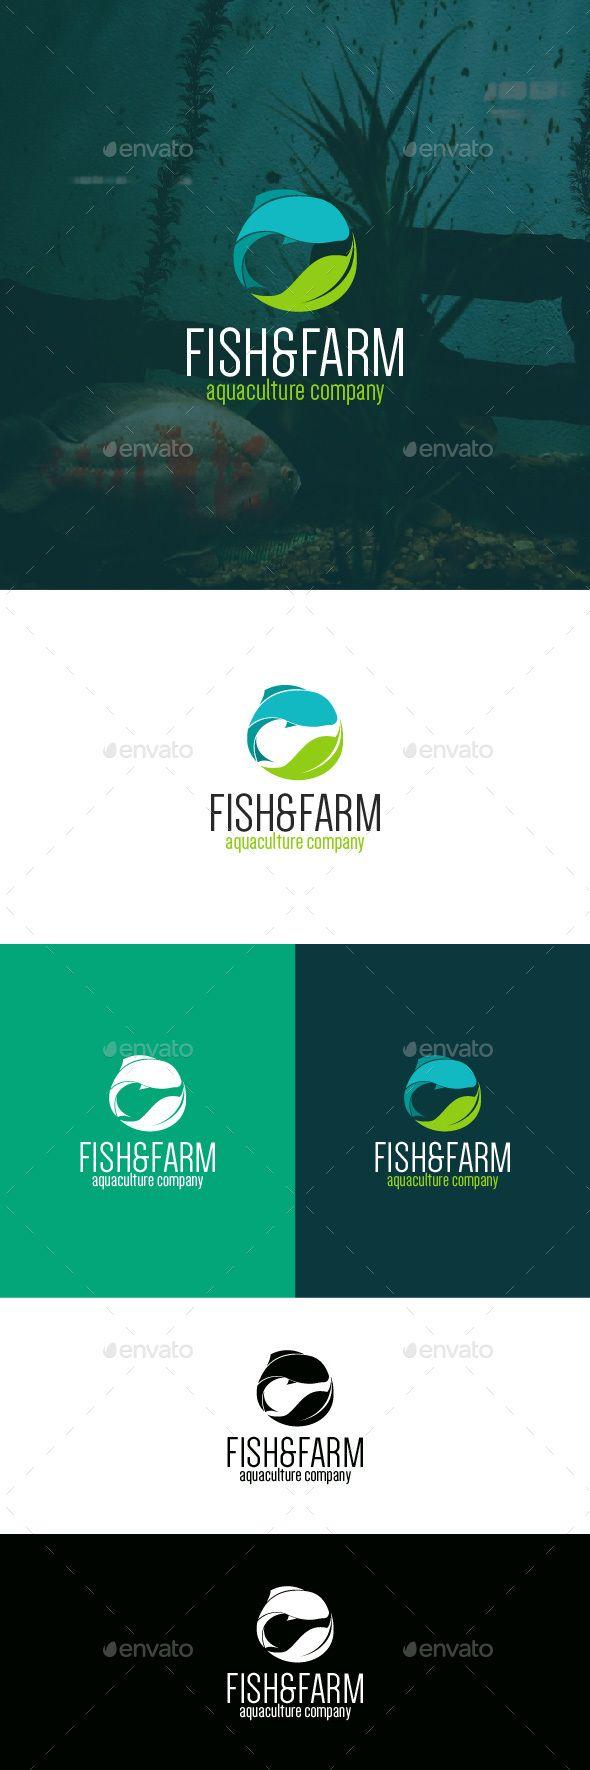 Fish & Farm - Logo Design Template Vector #logotype Download it here: http://graphicriver.net/item/fish-farm-logo-template/8983161?s_rank=640?ref=nexion